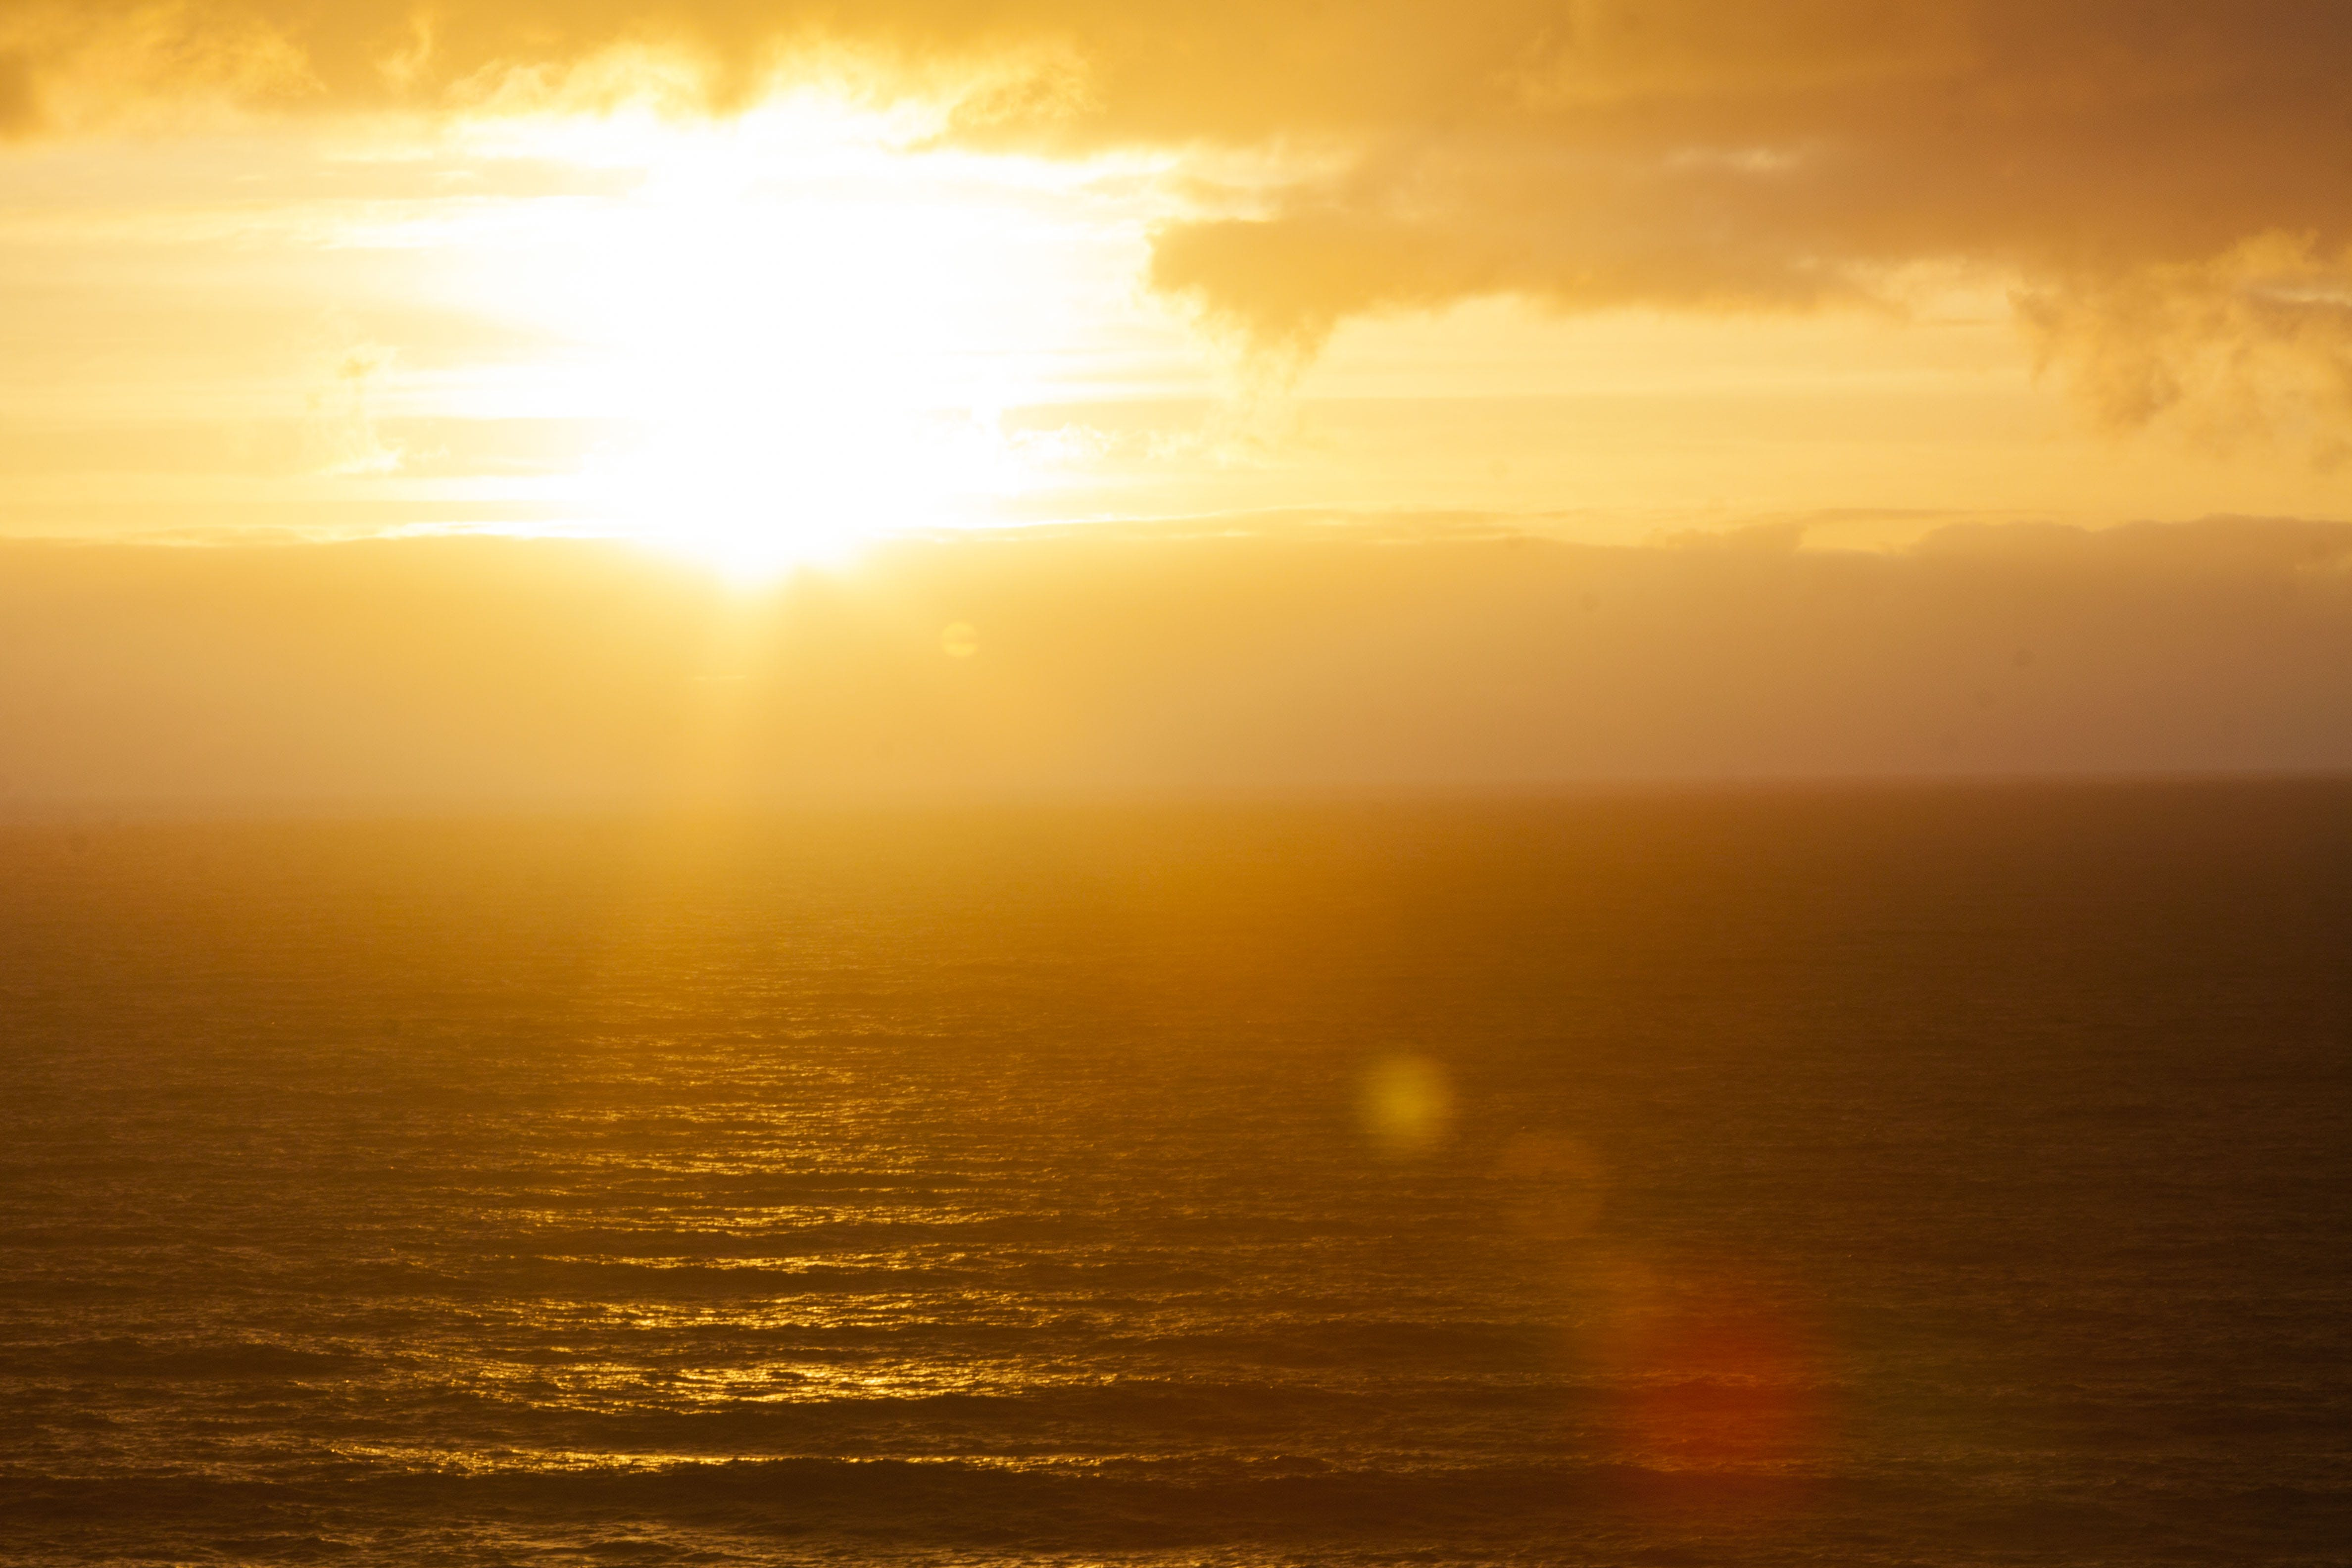 of evening sun, golden sun, ray of sunshine, sun